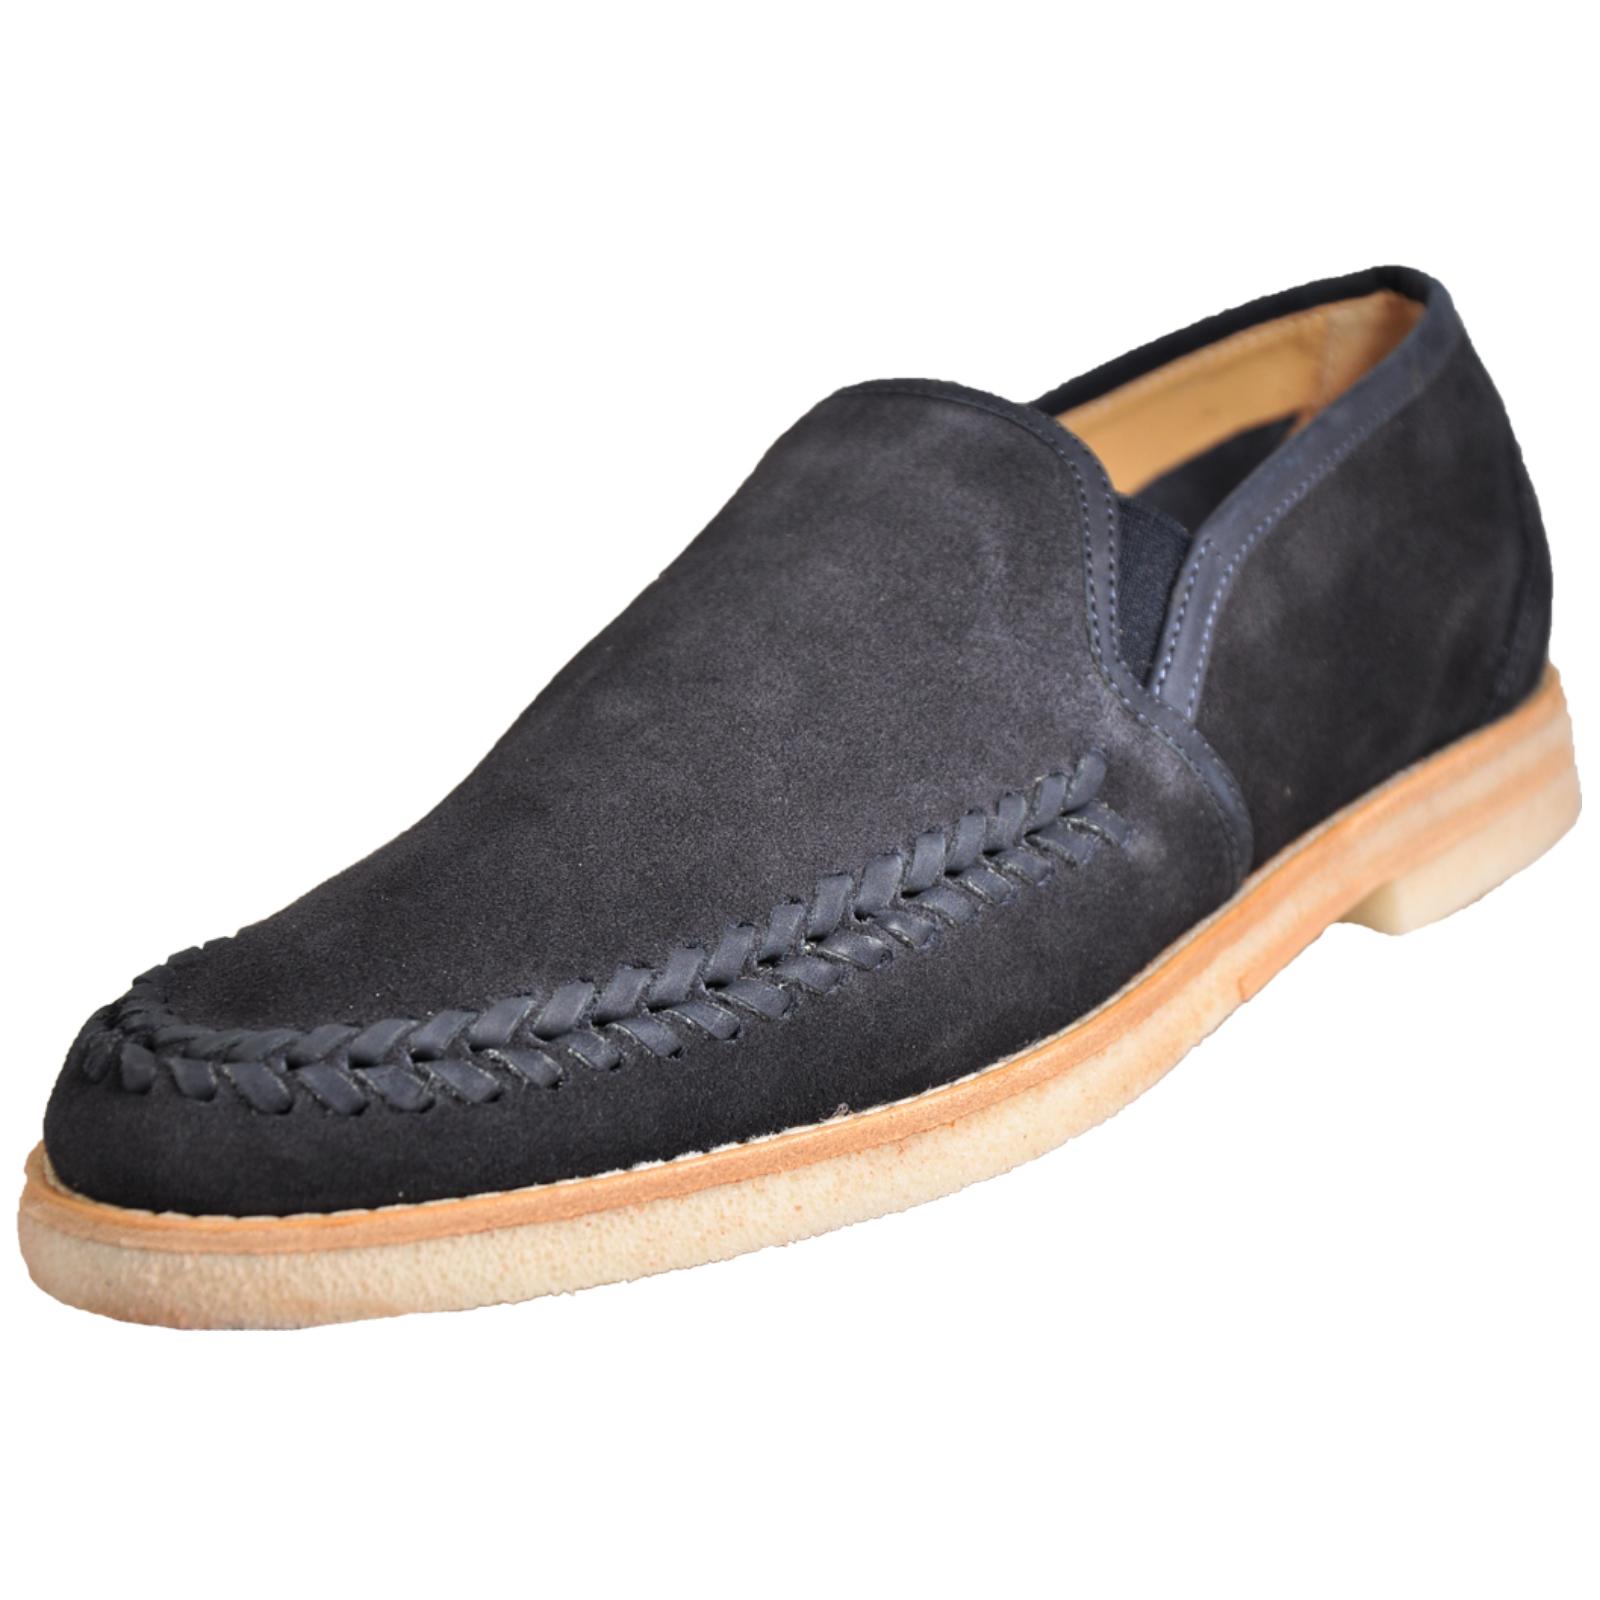 c483ec41b Details about H by Hudson Tangier Men s Formal Dress Fashion Slip on Loafer  Suede Leather Shoe